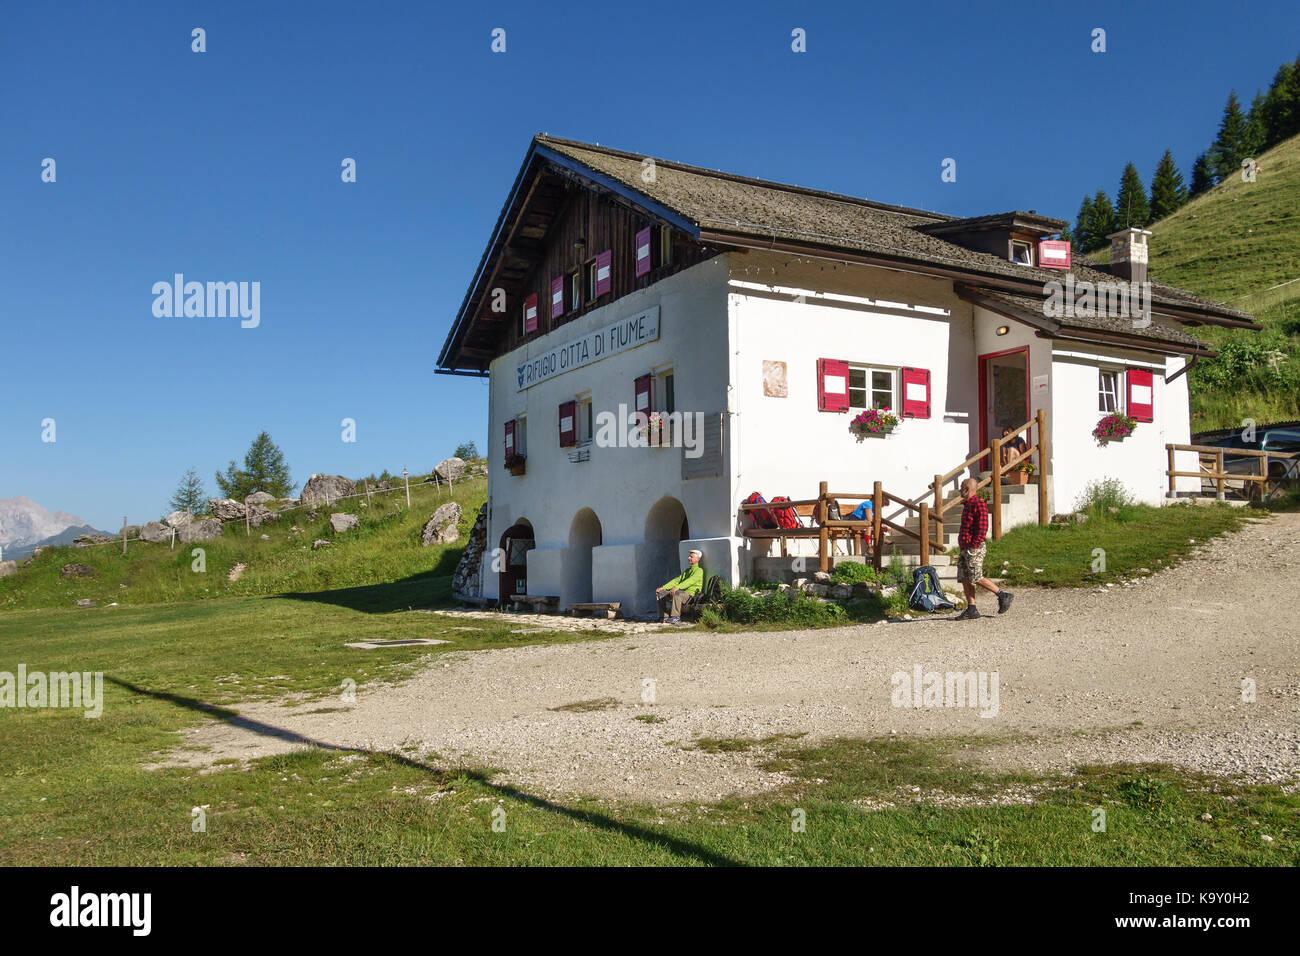 Die Dolomiten, Norditalien. Das berggasthaus Rifugio Citta di Fiume auf der Alta Via 1 Long distance Path Stockbild